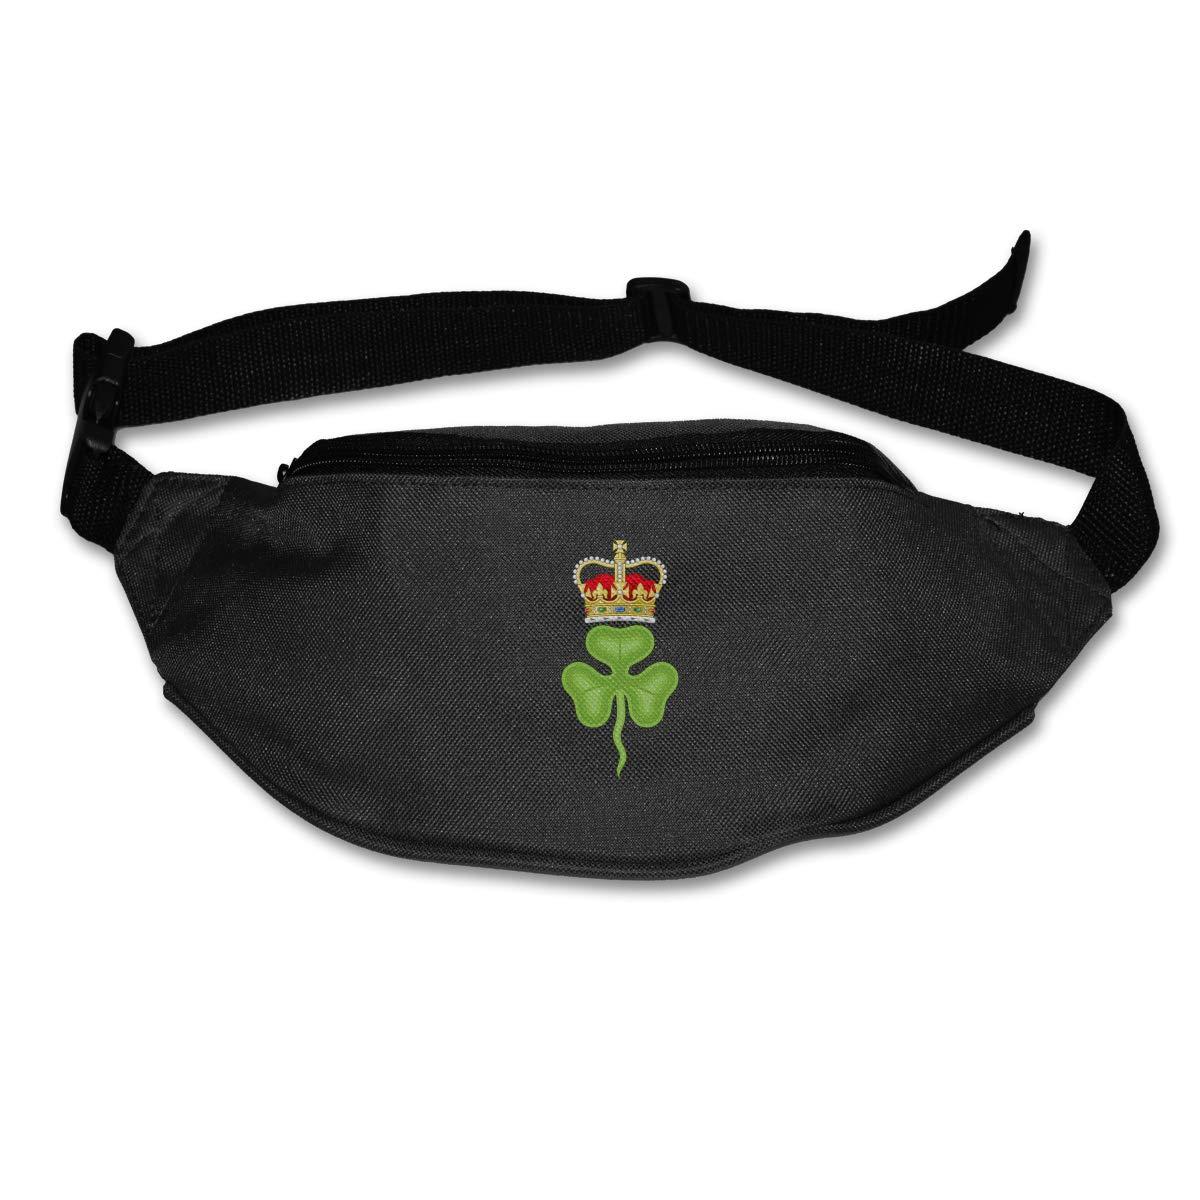 Crown Clover Sport Waist Packs Fanny Pack Adjustable For Run